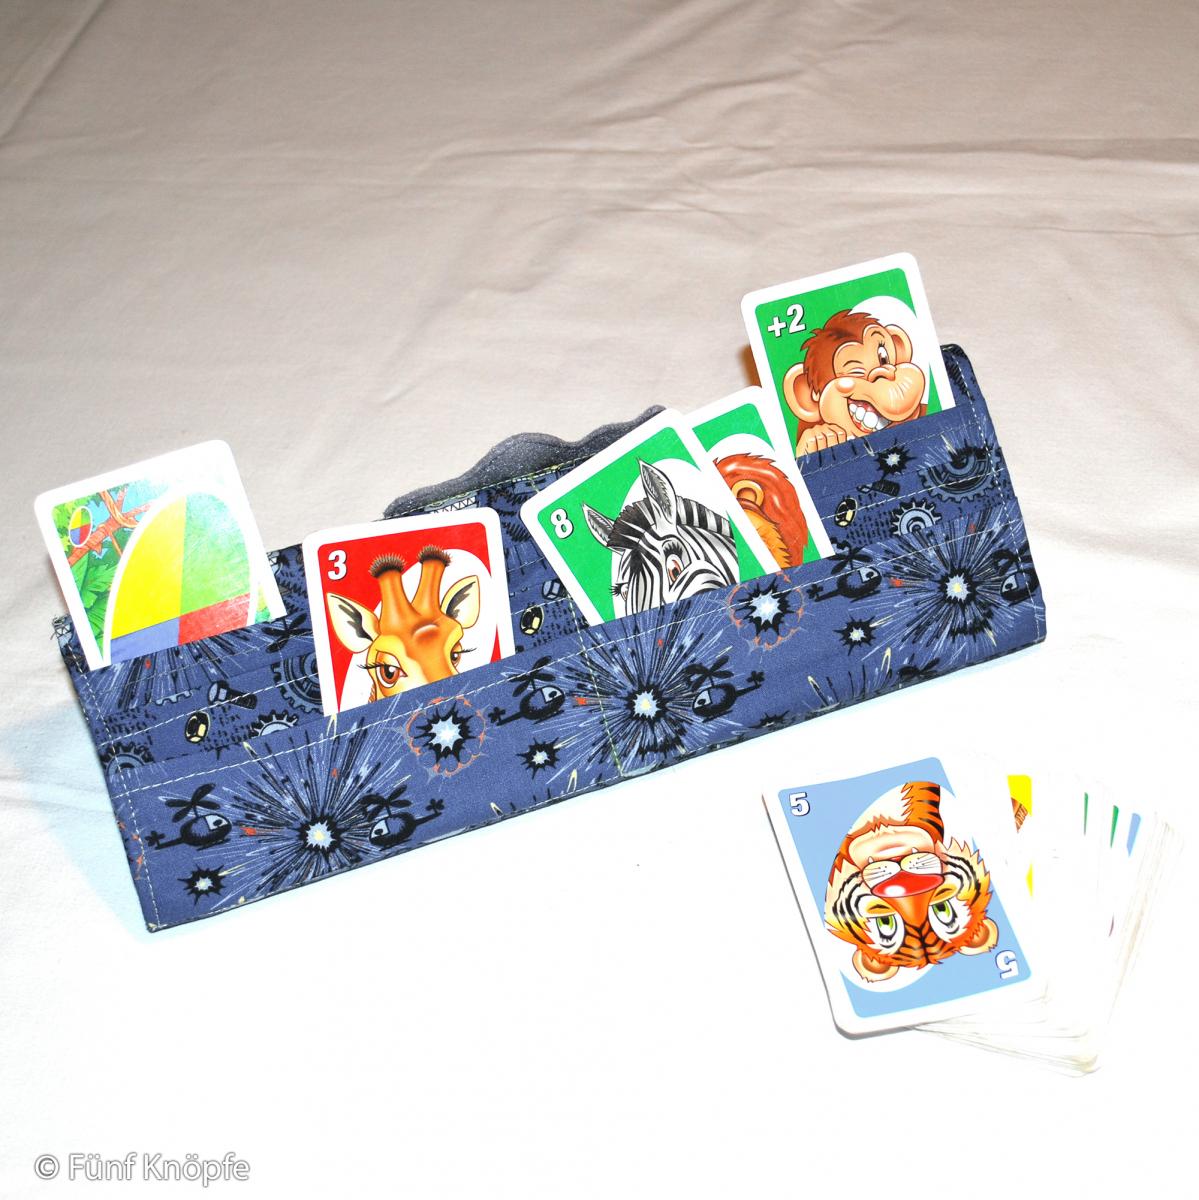 Fünf Knöpfe: Kartenhalter / GoodWeib´s Mädchenkram.